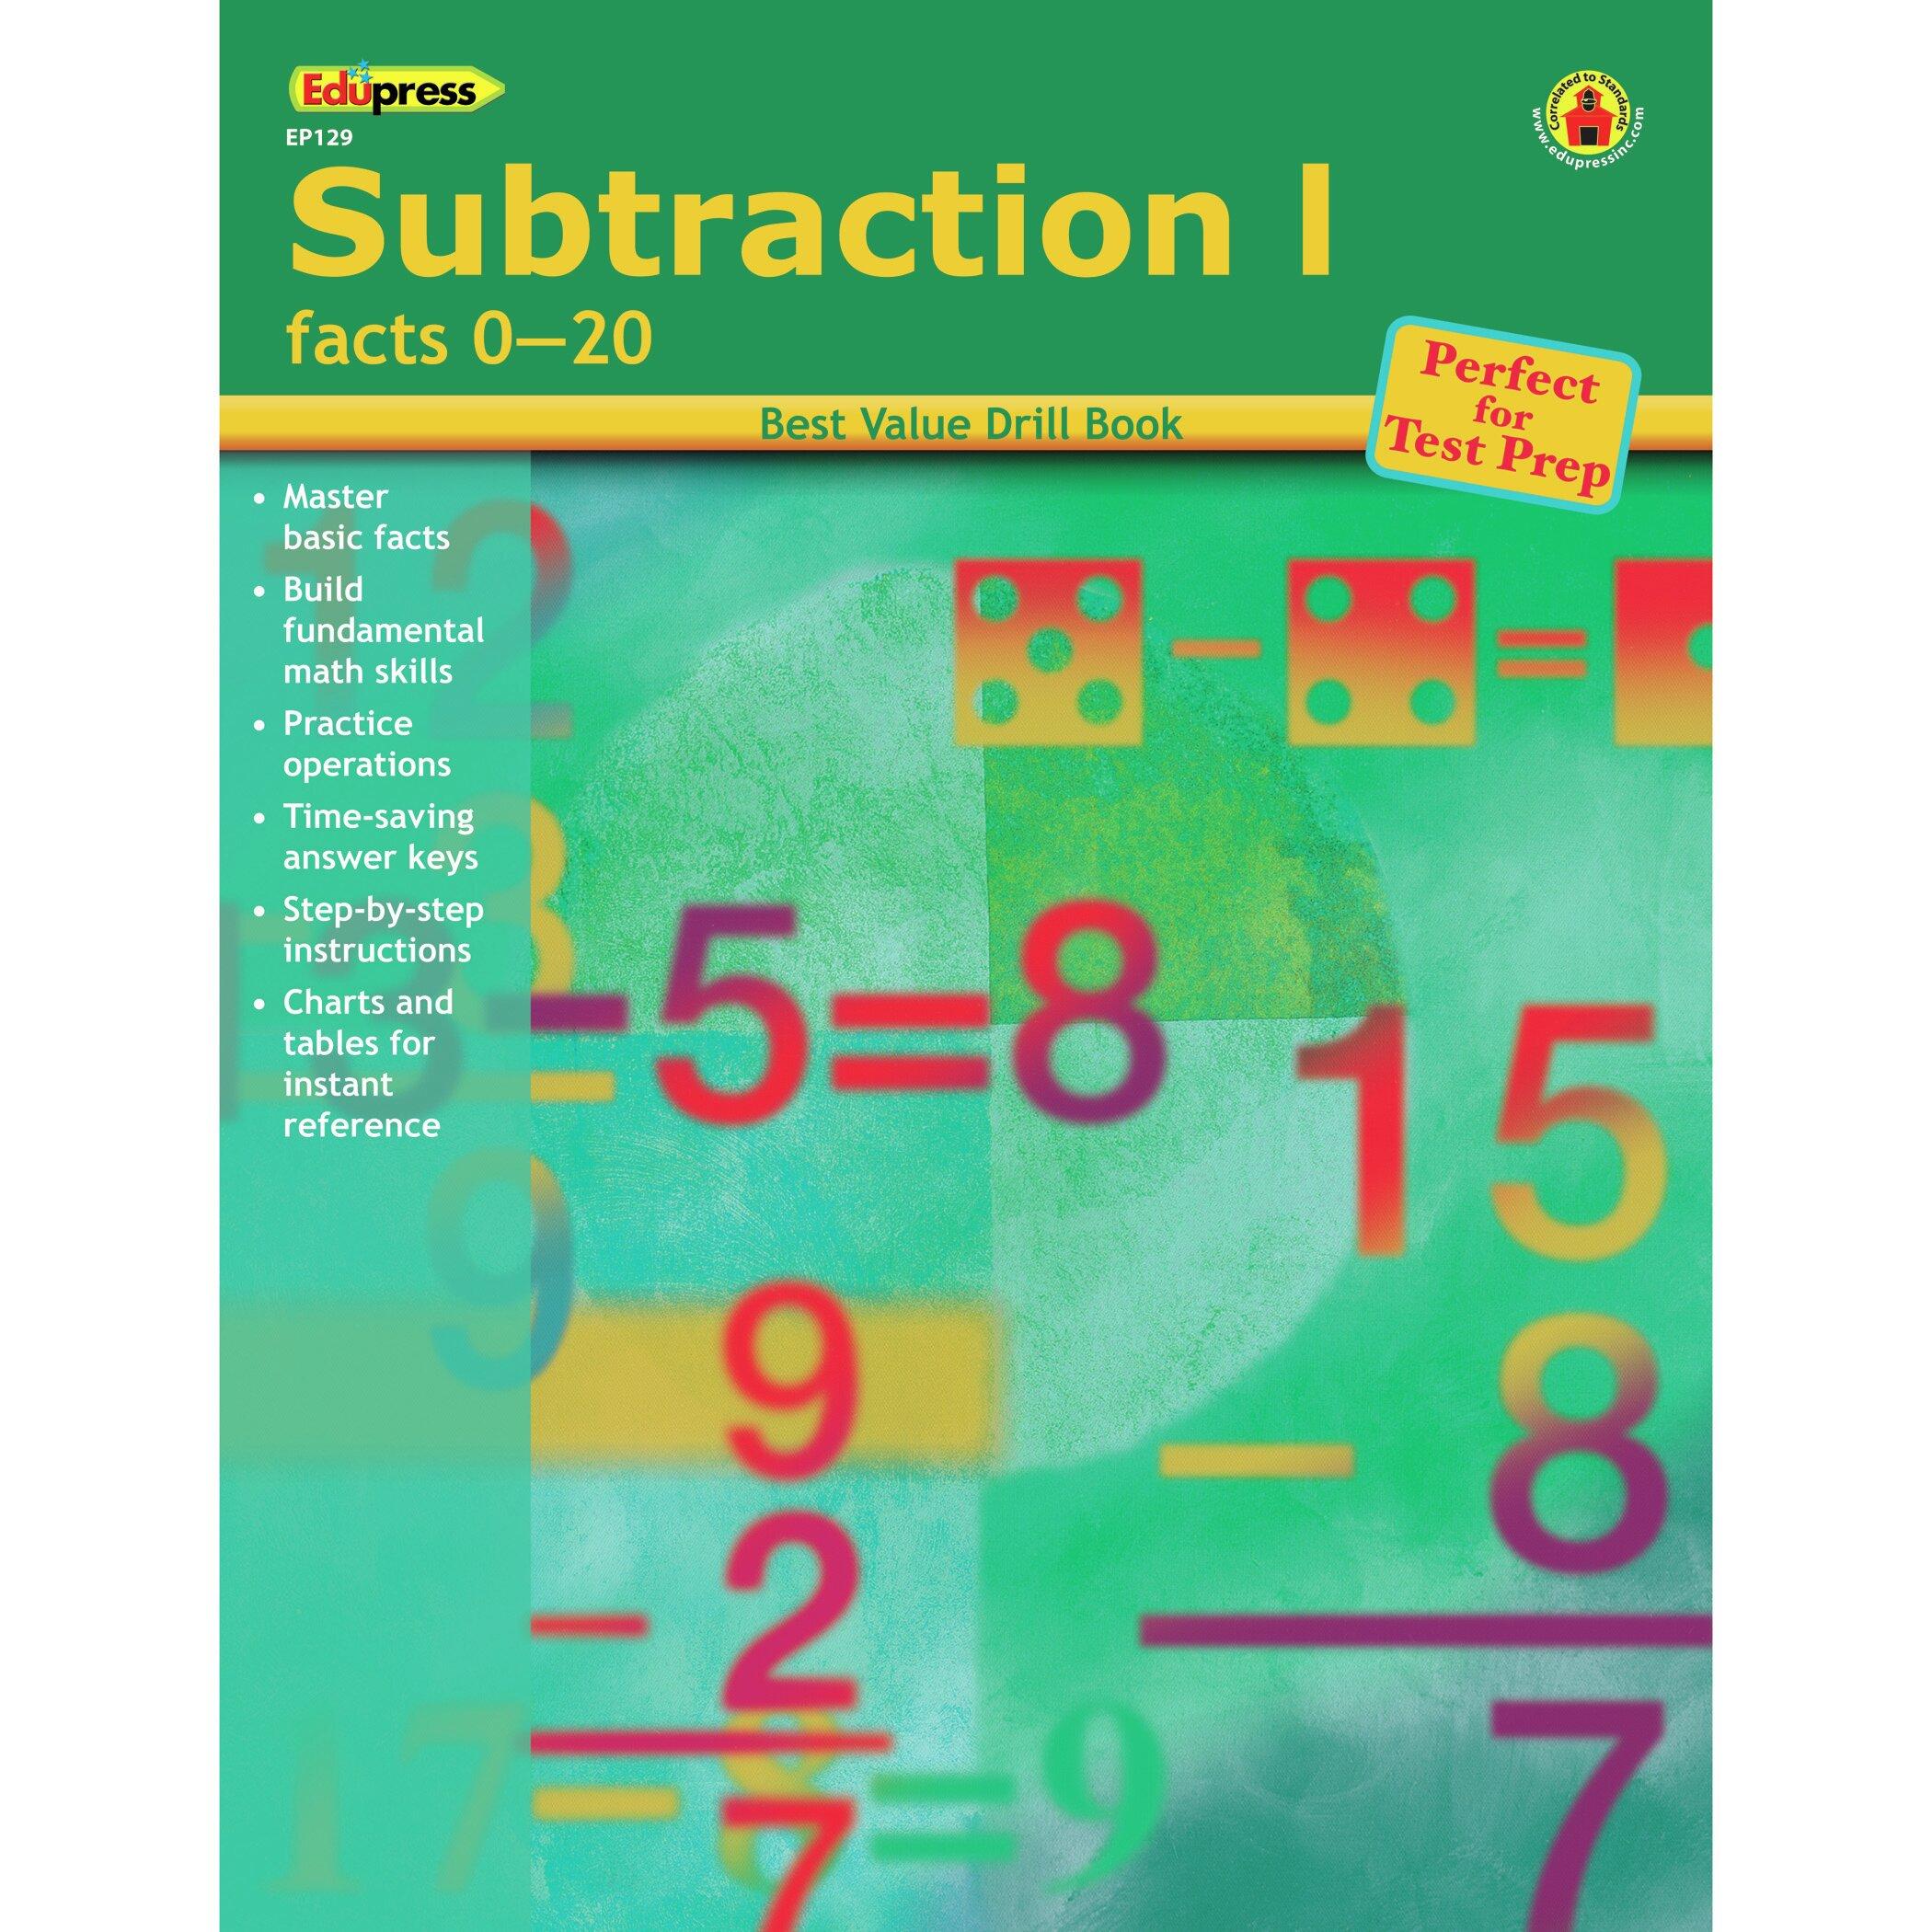 Edupress Subtraction 1 Facts 0-20 Book | Wayfair